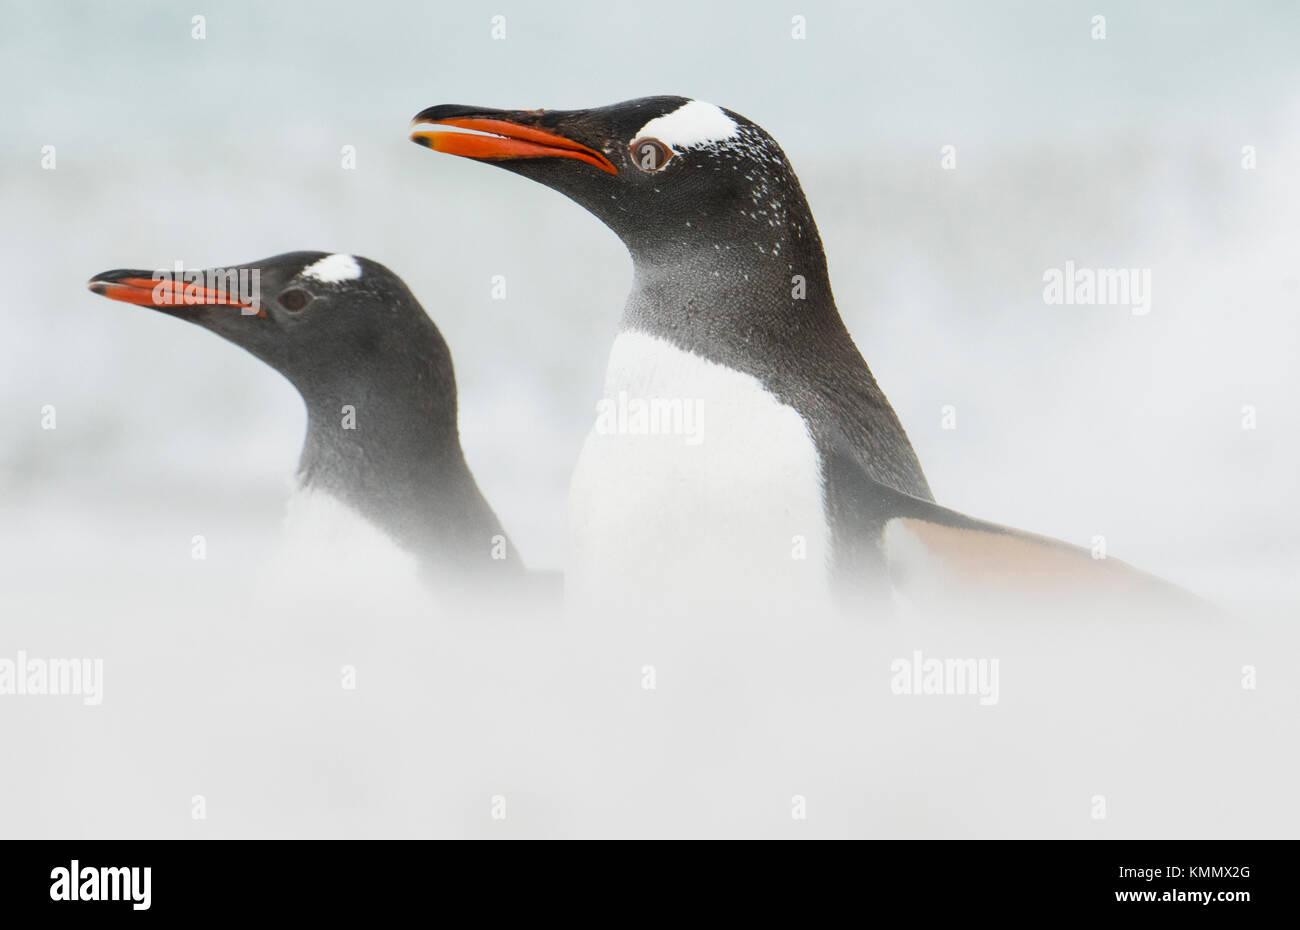 Gentoo Penguins (Pygoscelis papua) Falkland islands - Stock Image